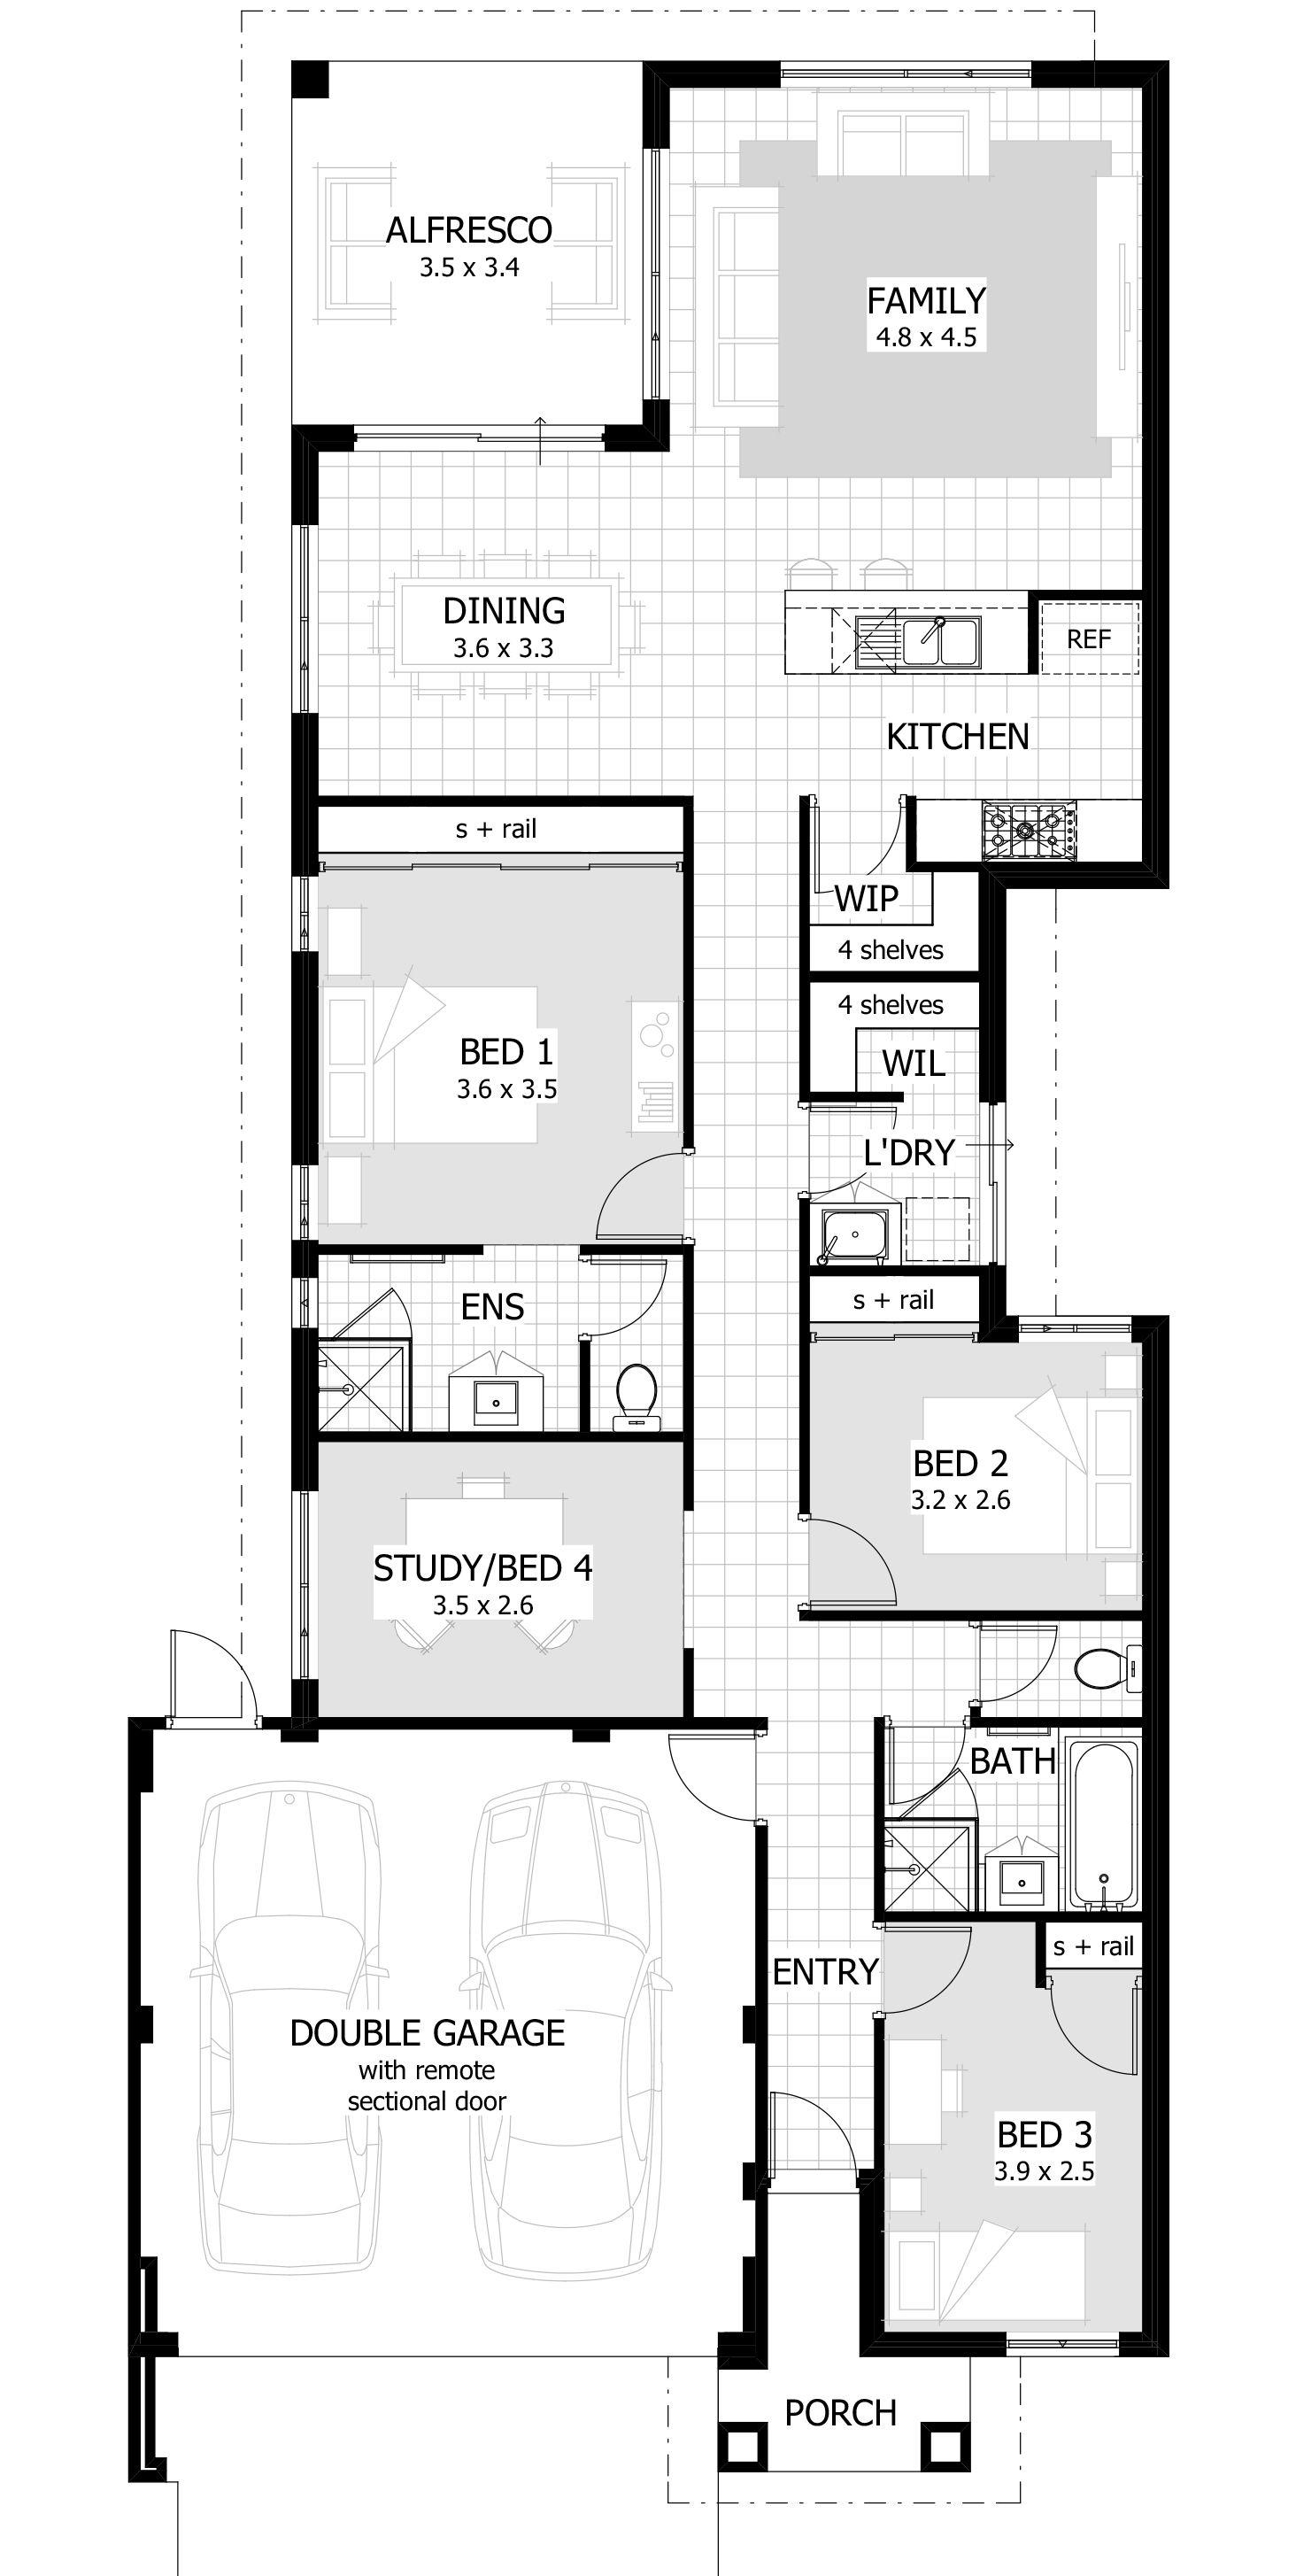 Terrace House Reddit Single Storey House Plans 4 Bedroom House Plans House Plans Australia